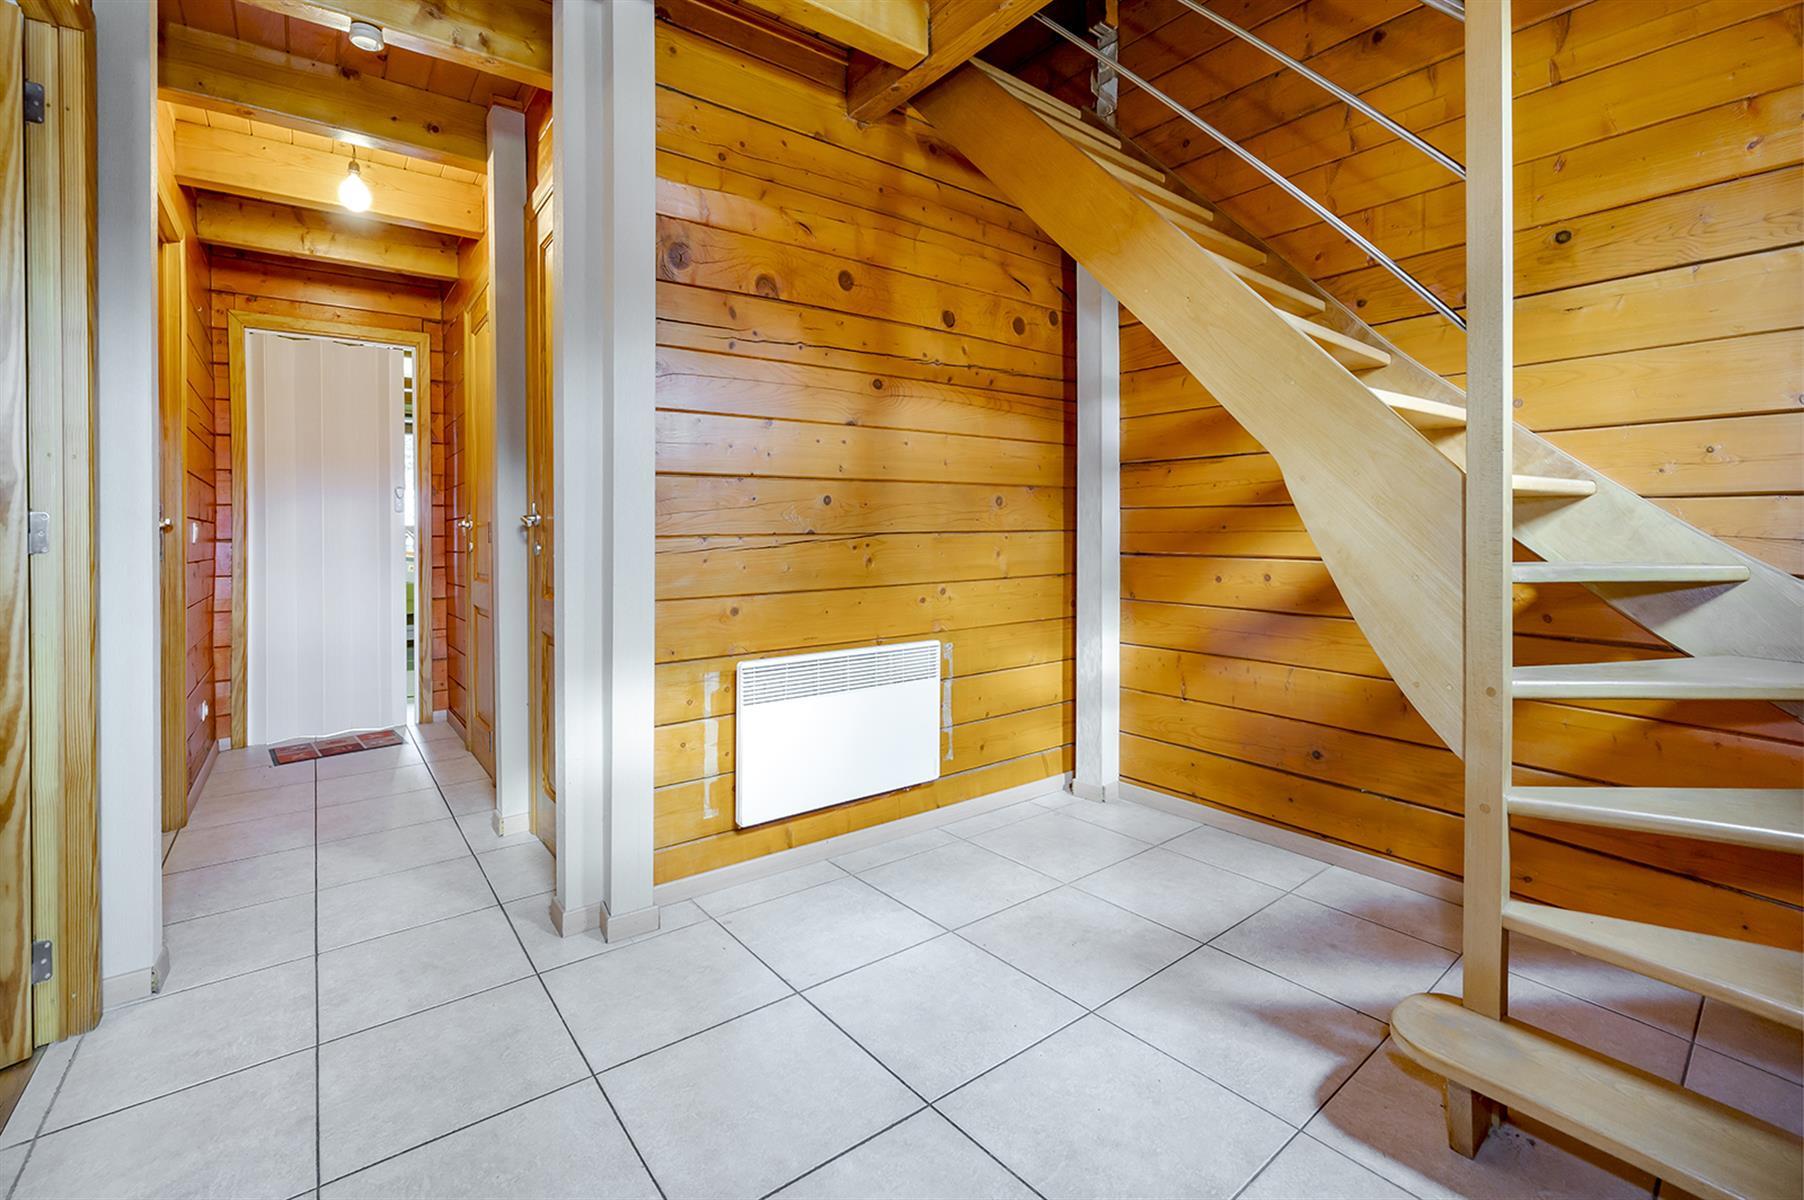 Maison - Berloz - #4189505-3